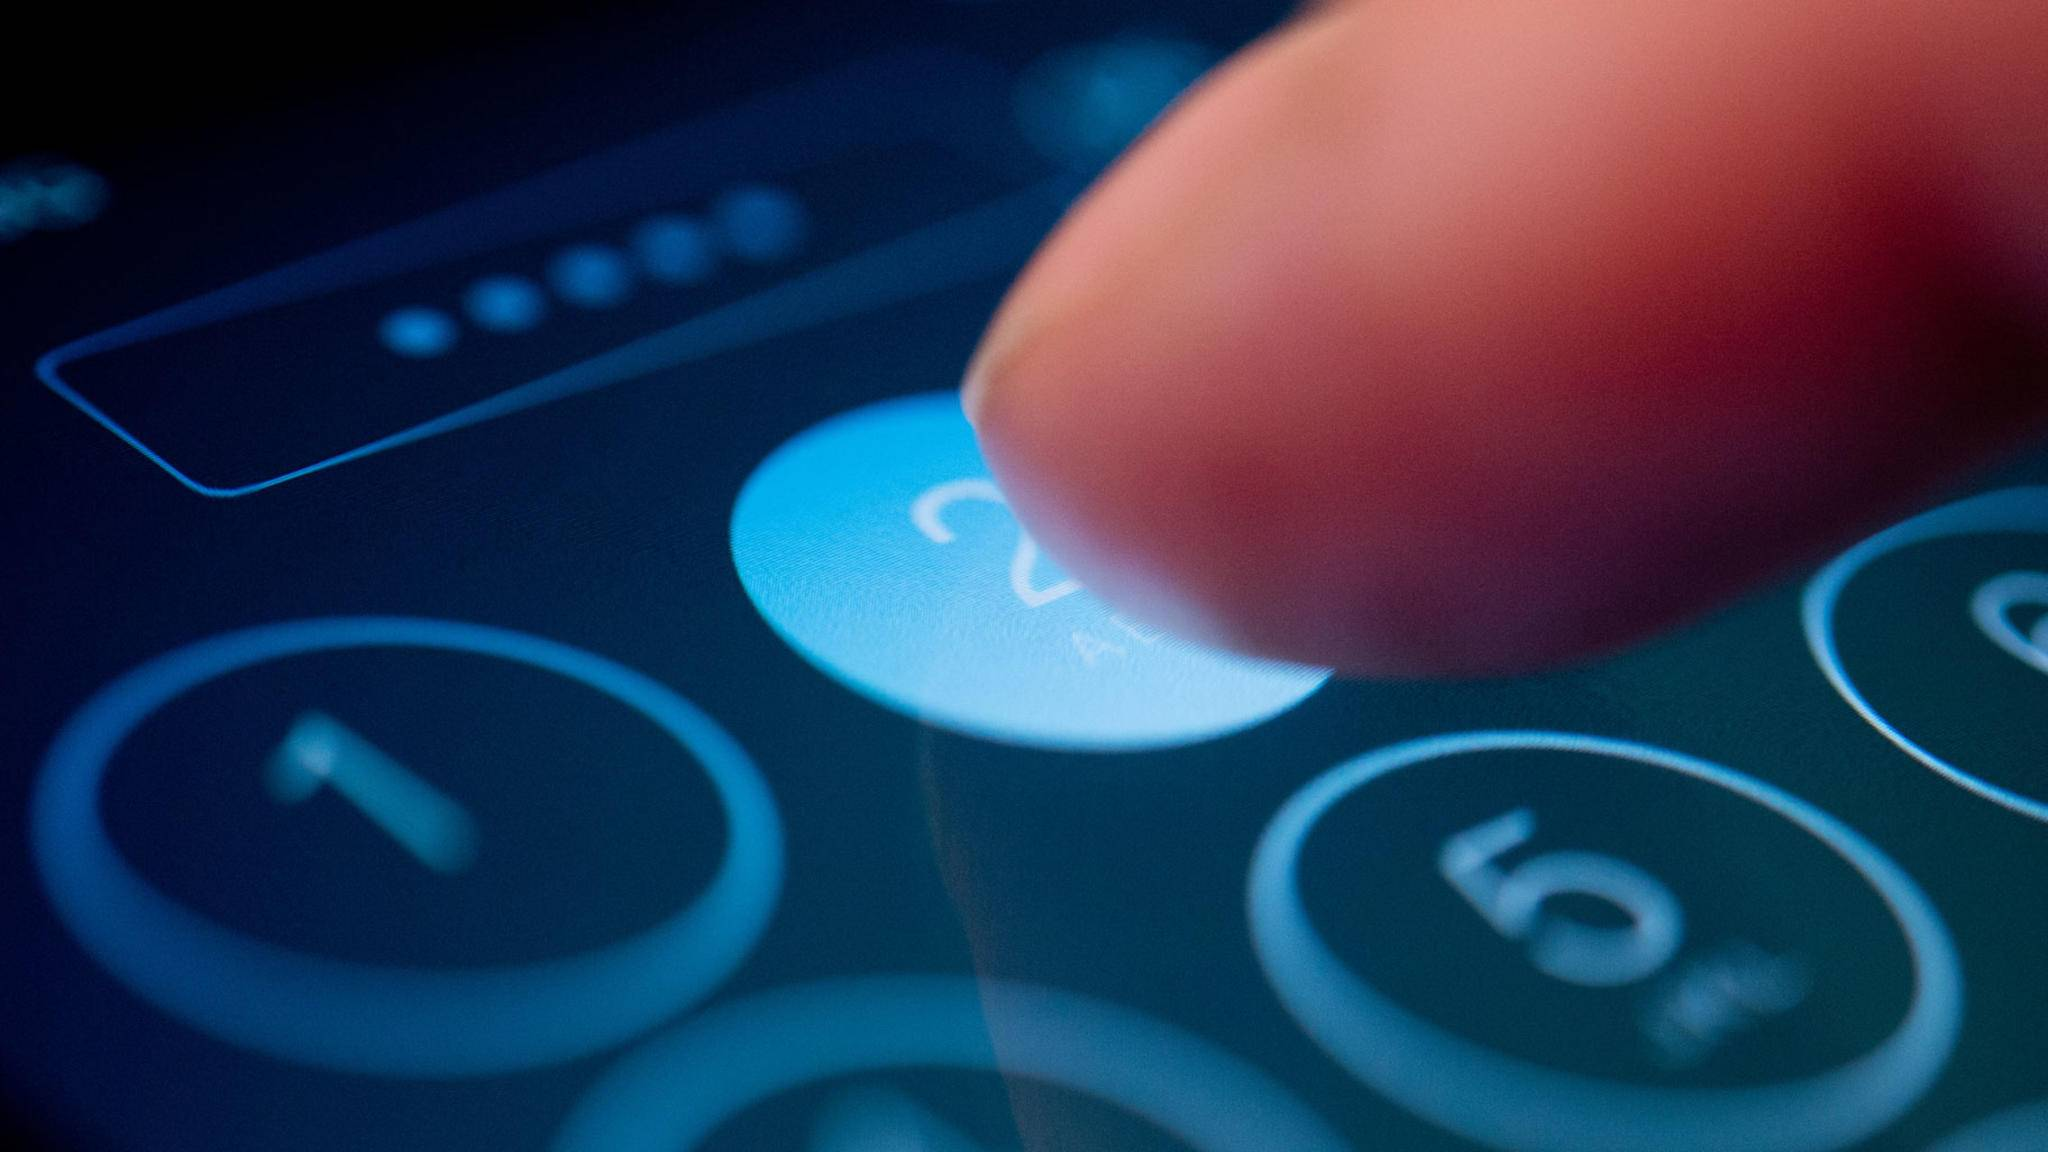 iPhone Code